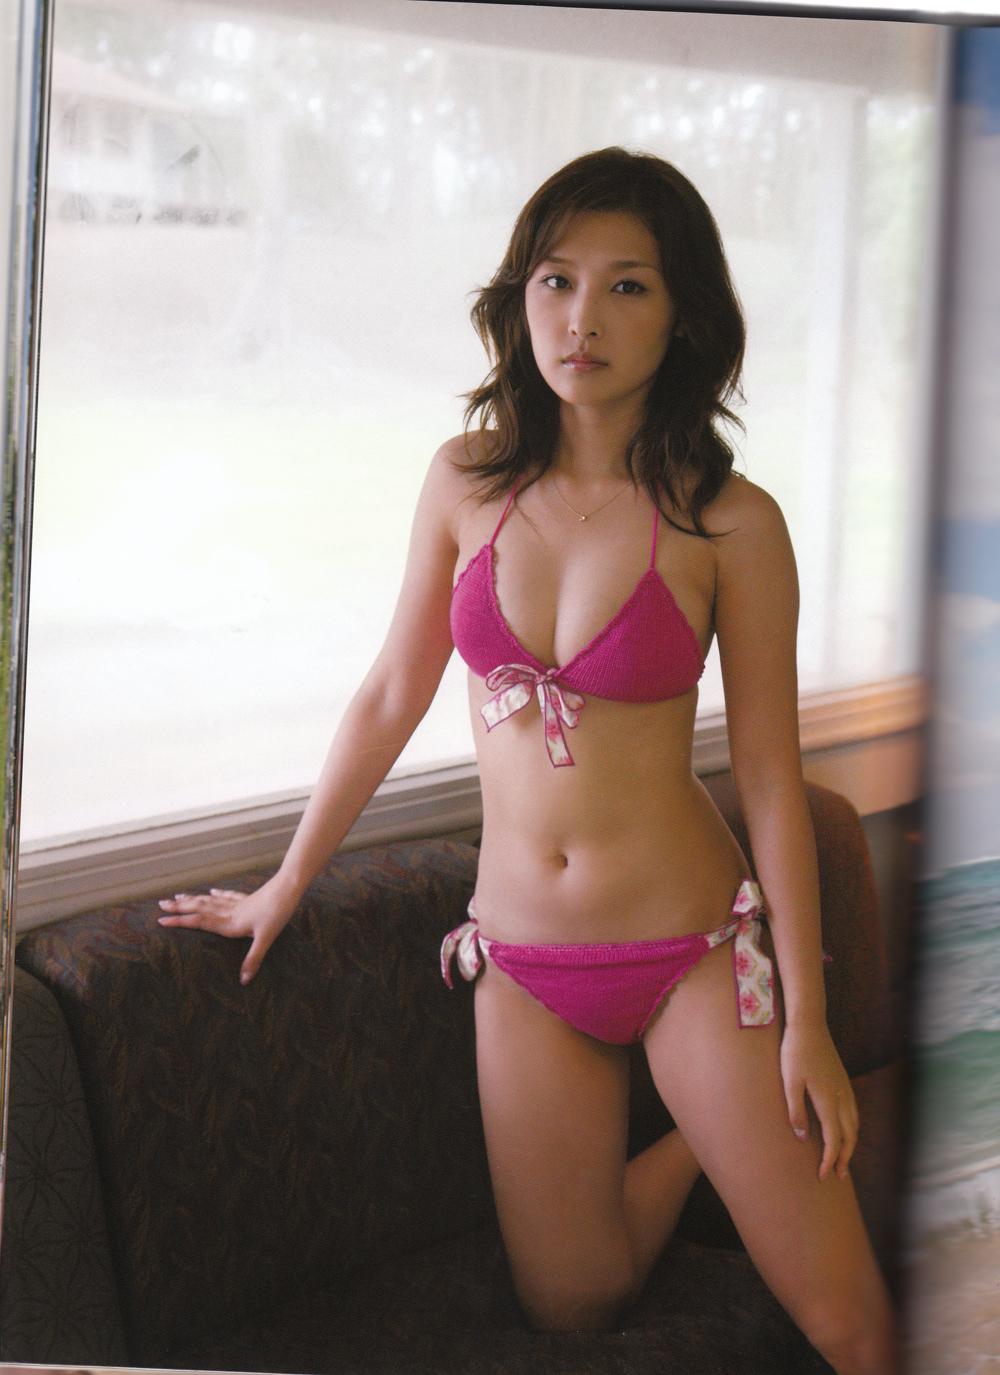 Bikini Bonanza Morningtime